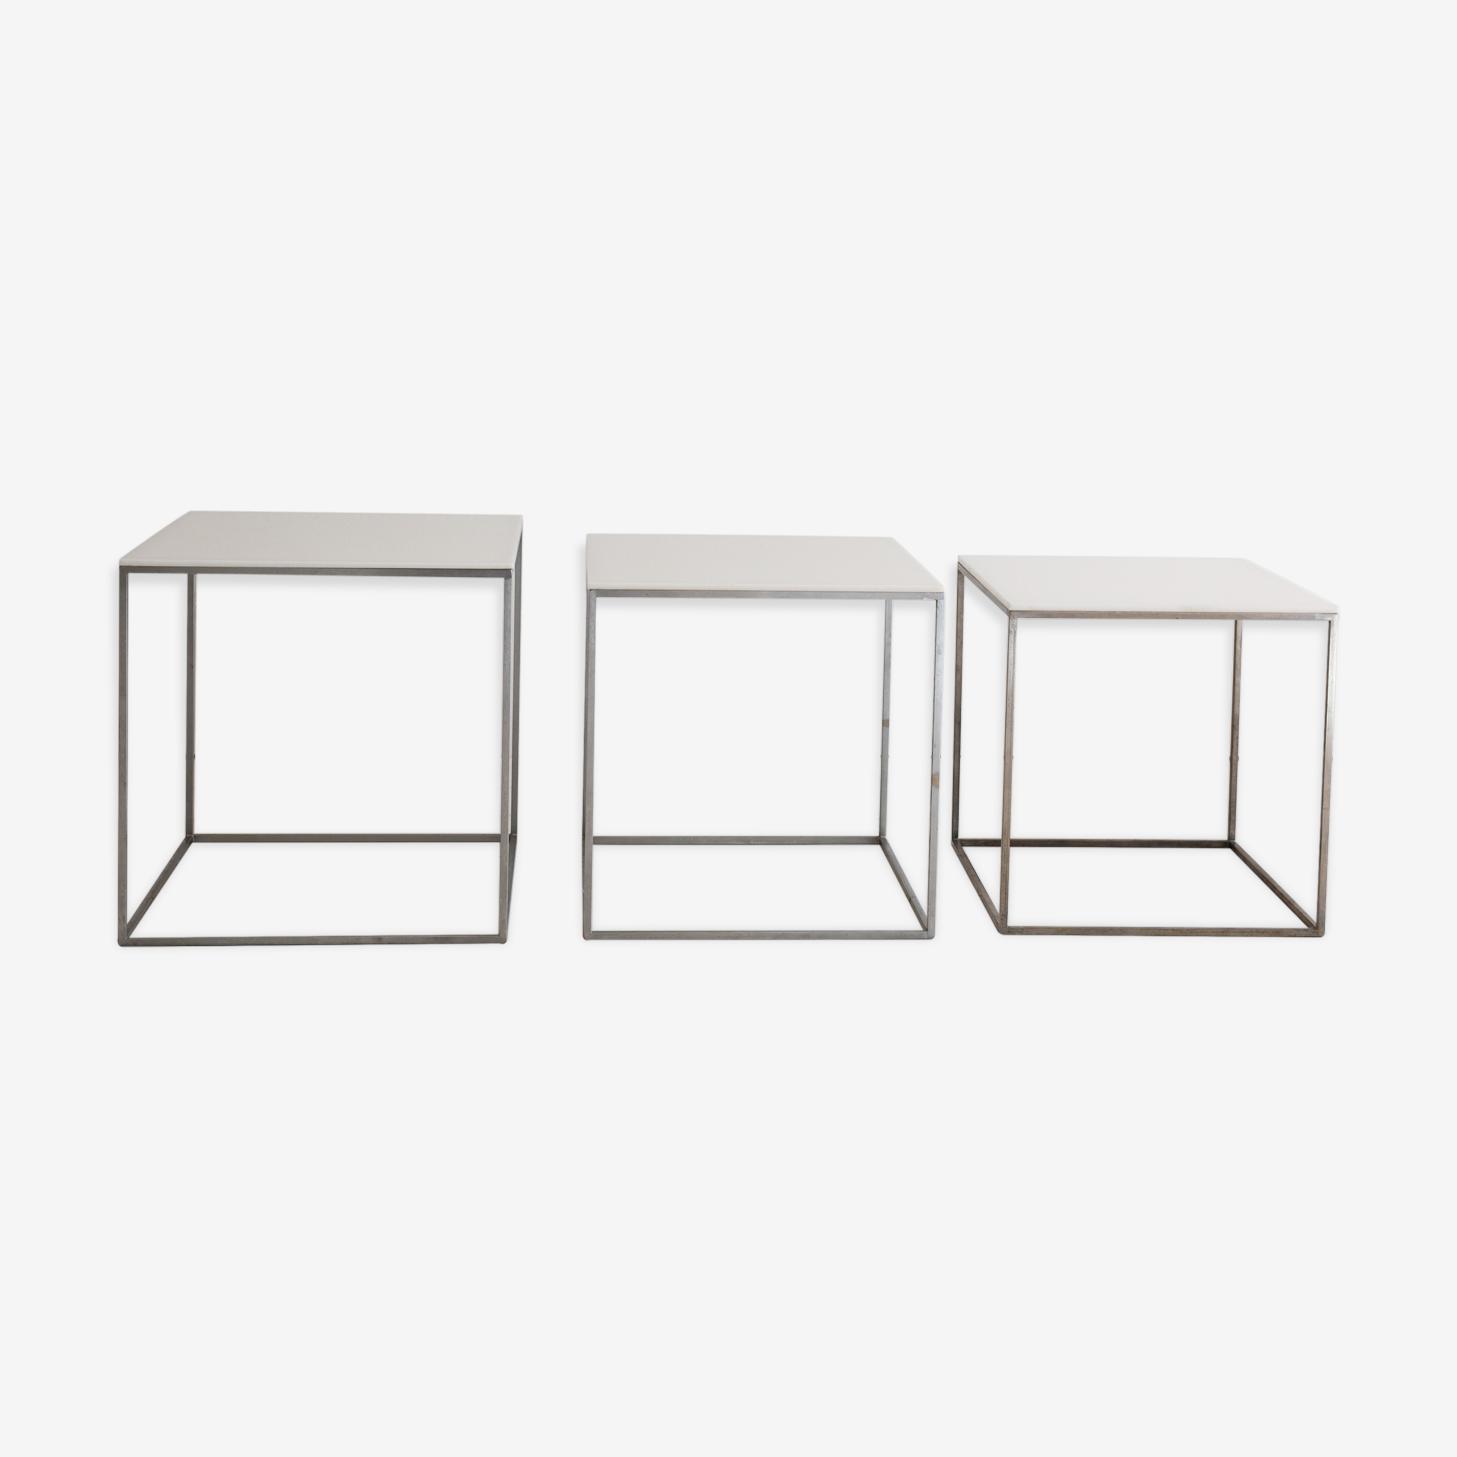 Series of three tables gigilgnes Poul Kjaerholm PK71, Ejvind Kold Christensen, 1957